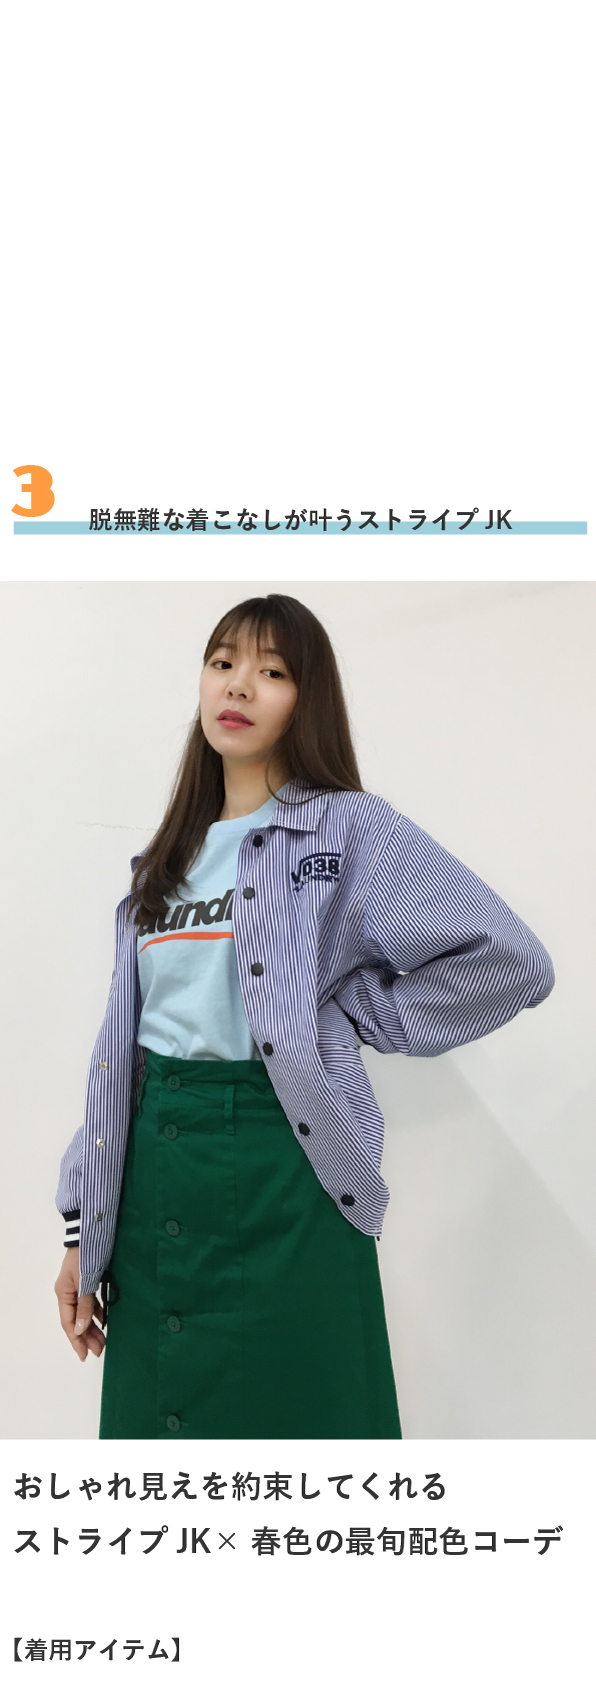 0303haori-06-596